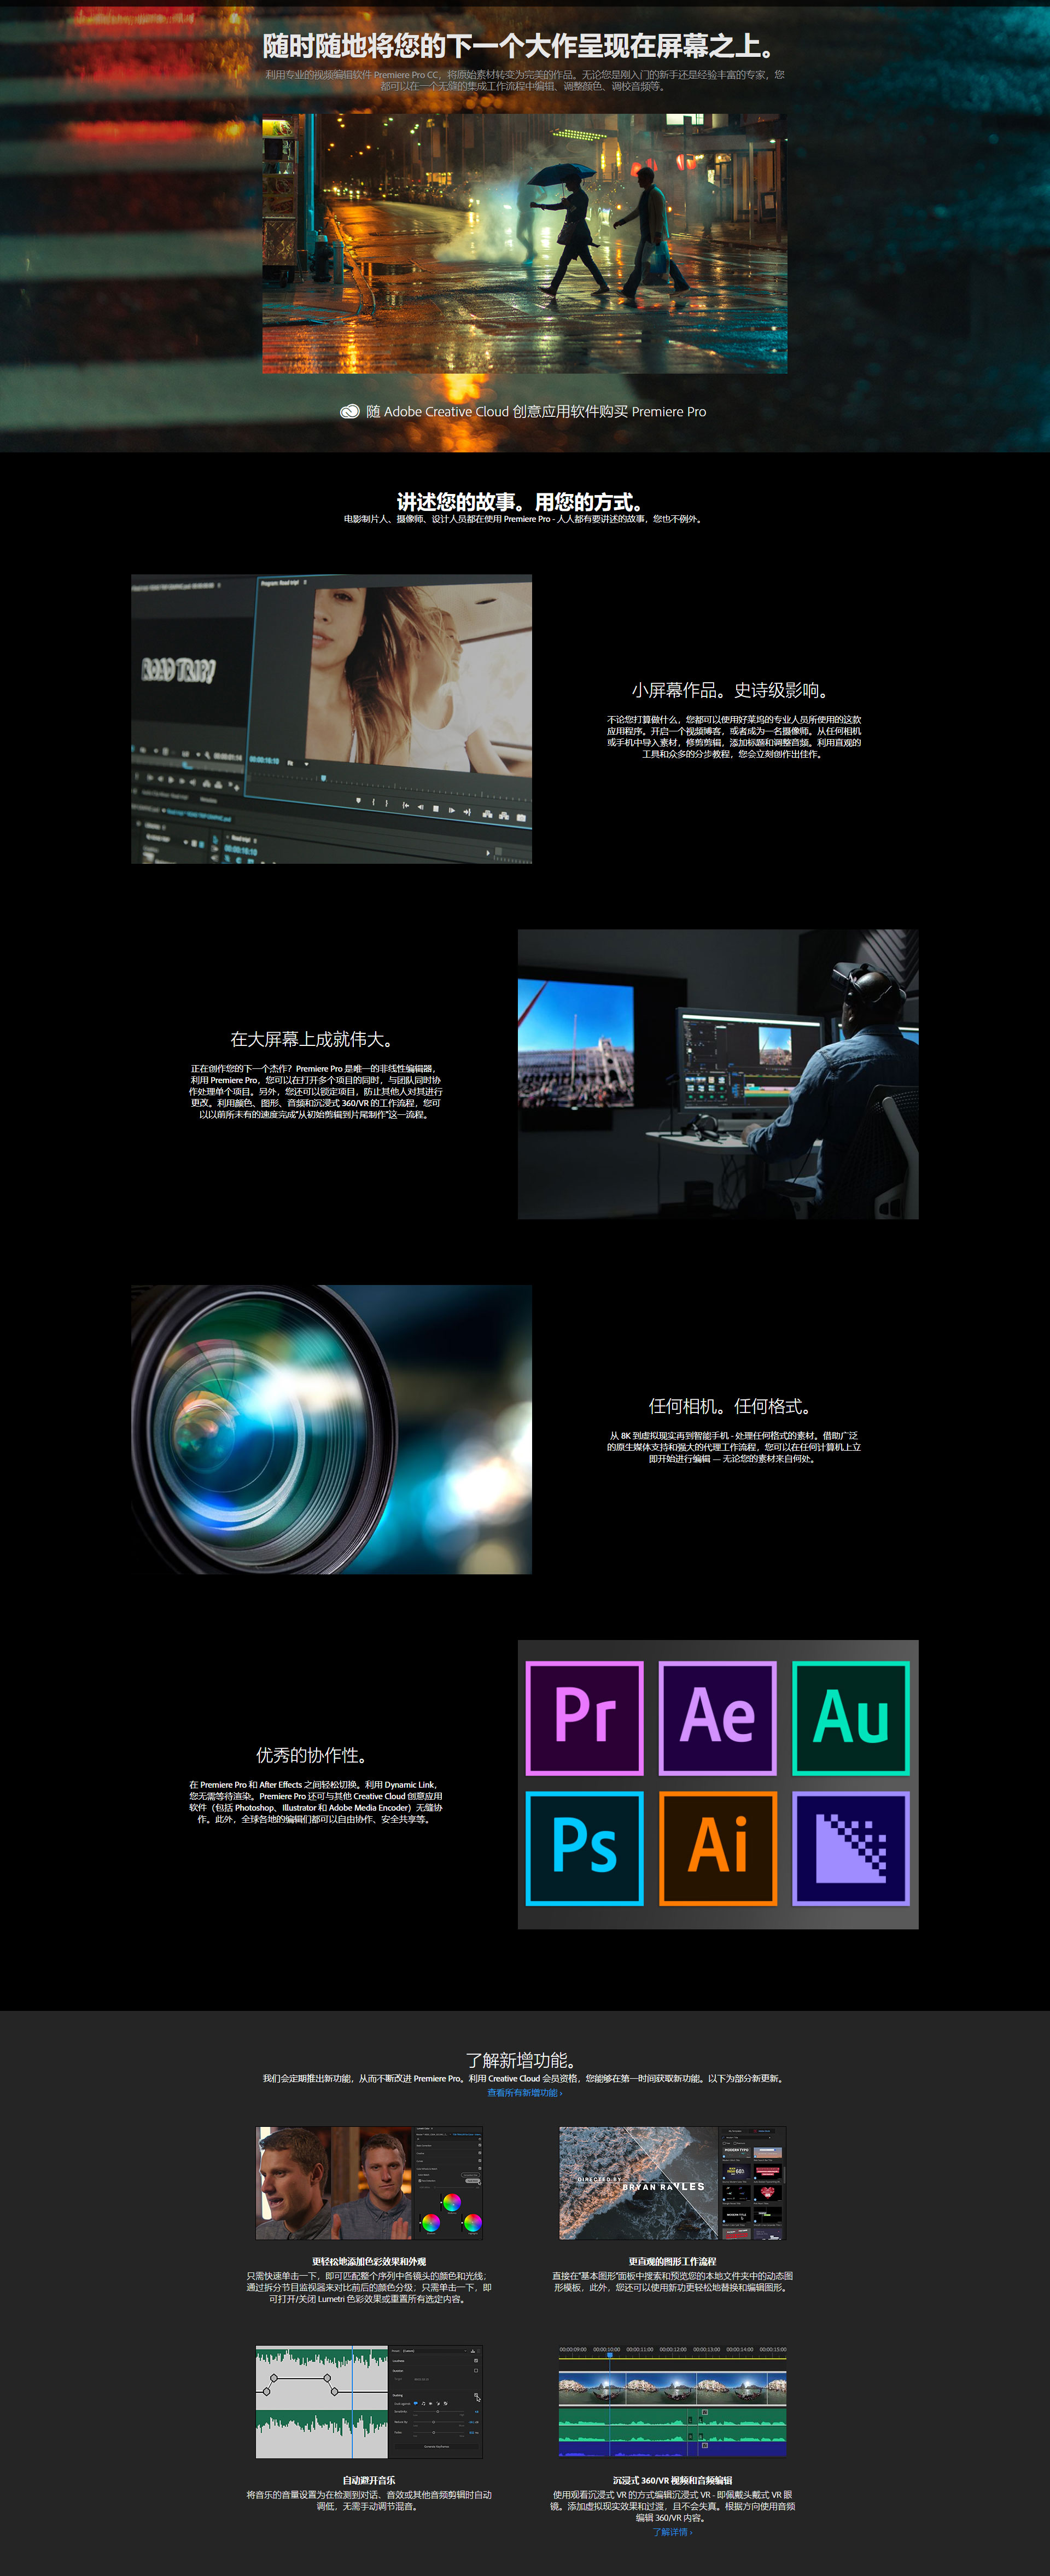 photoshop cc 2019 破解 版